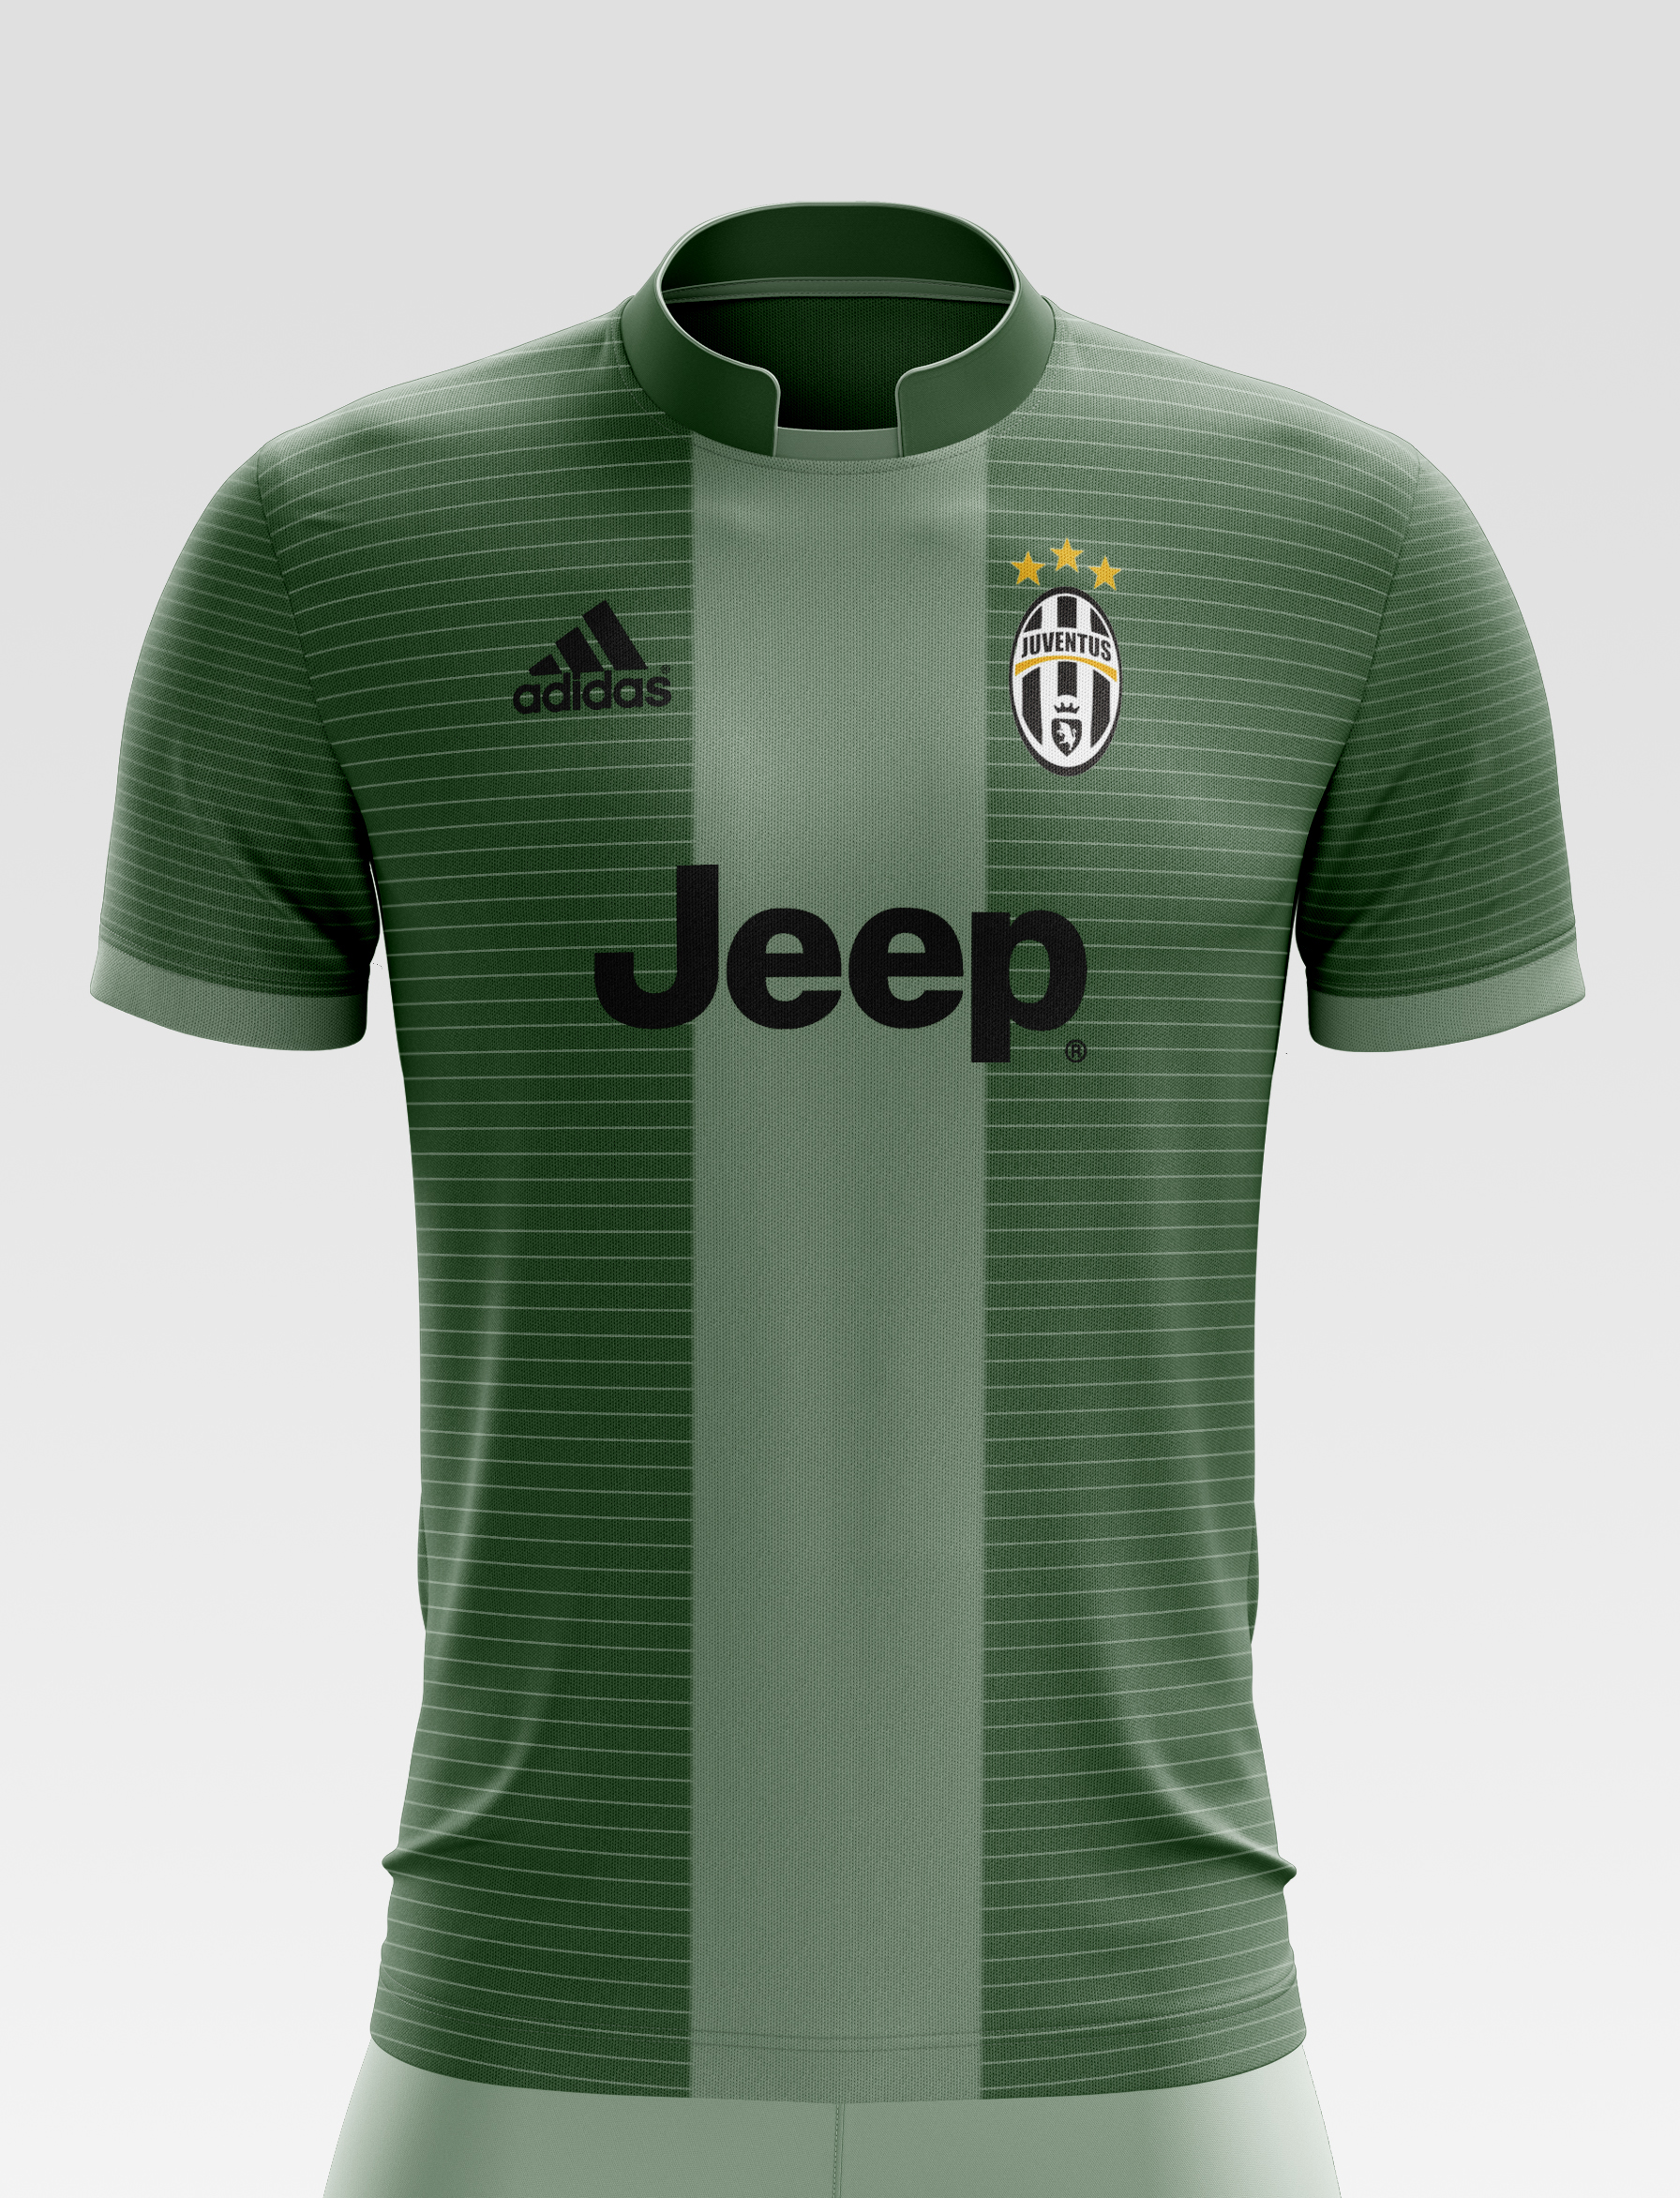 8ae7e62bdac Juventus FC Football Kit 17 18. on Behance